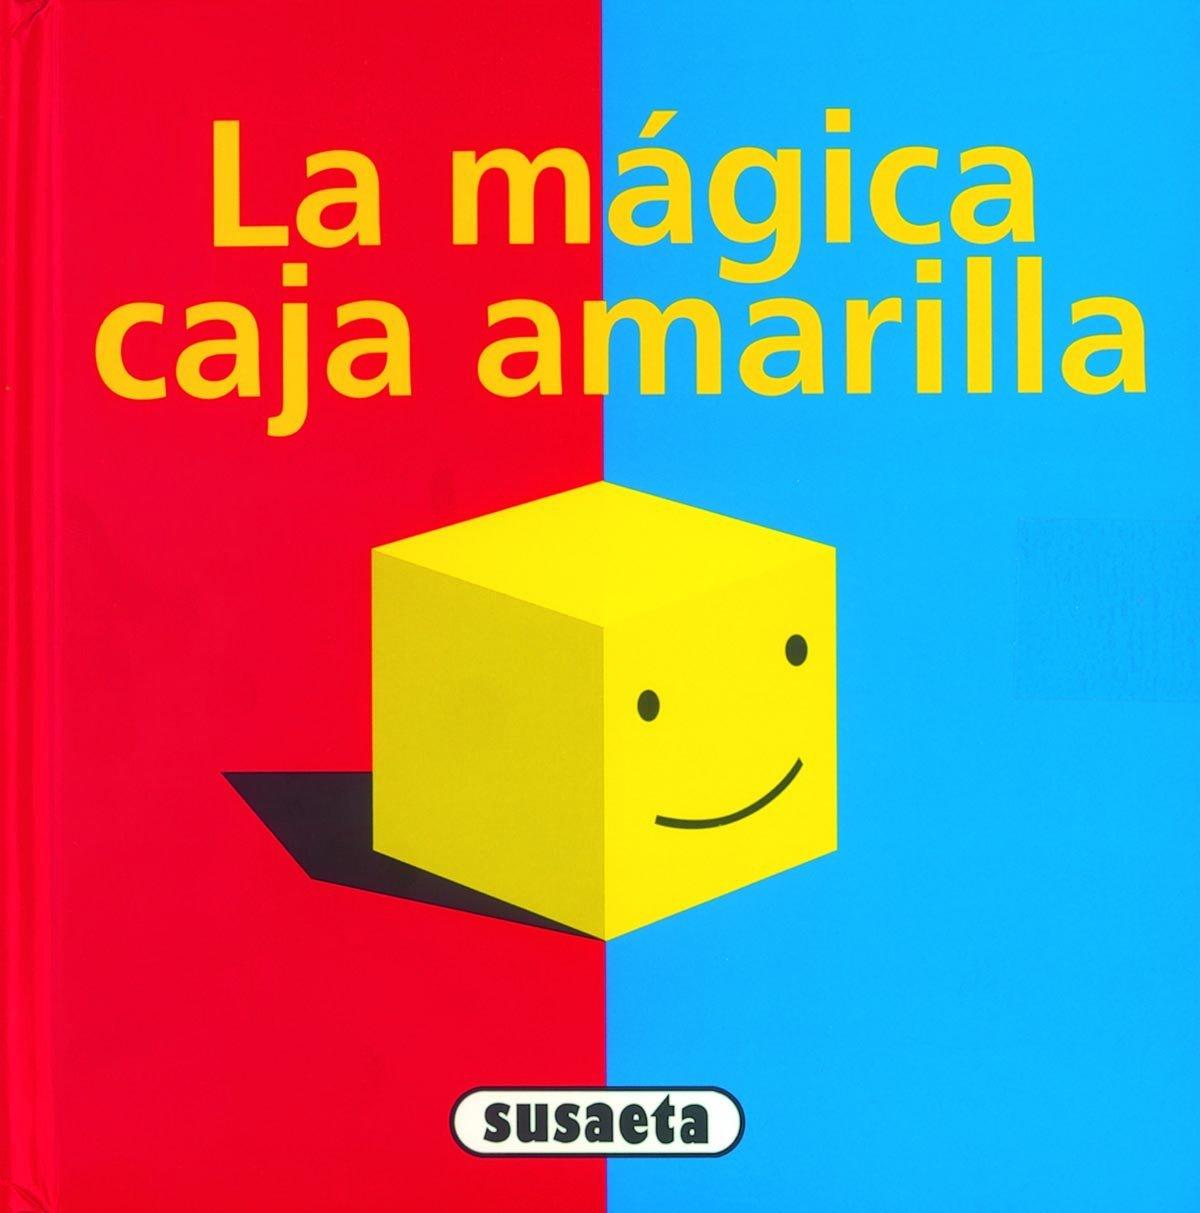 La mágica caja amarilla (La magica caja amarilla): Amazon.es ...